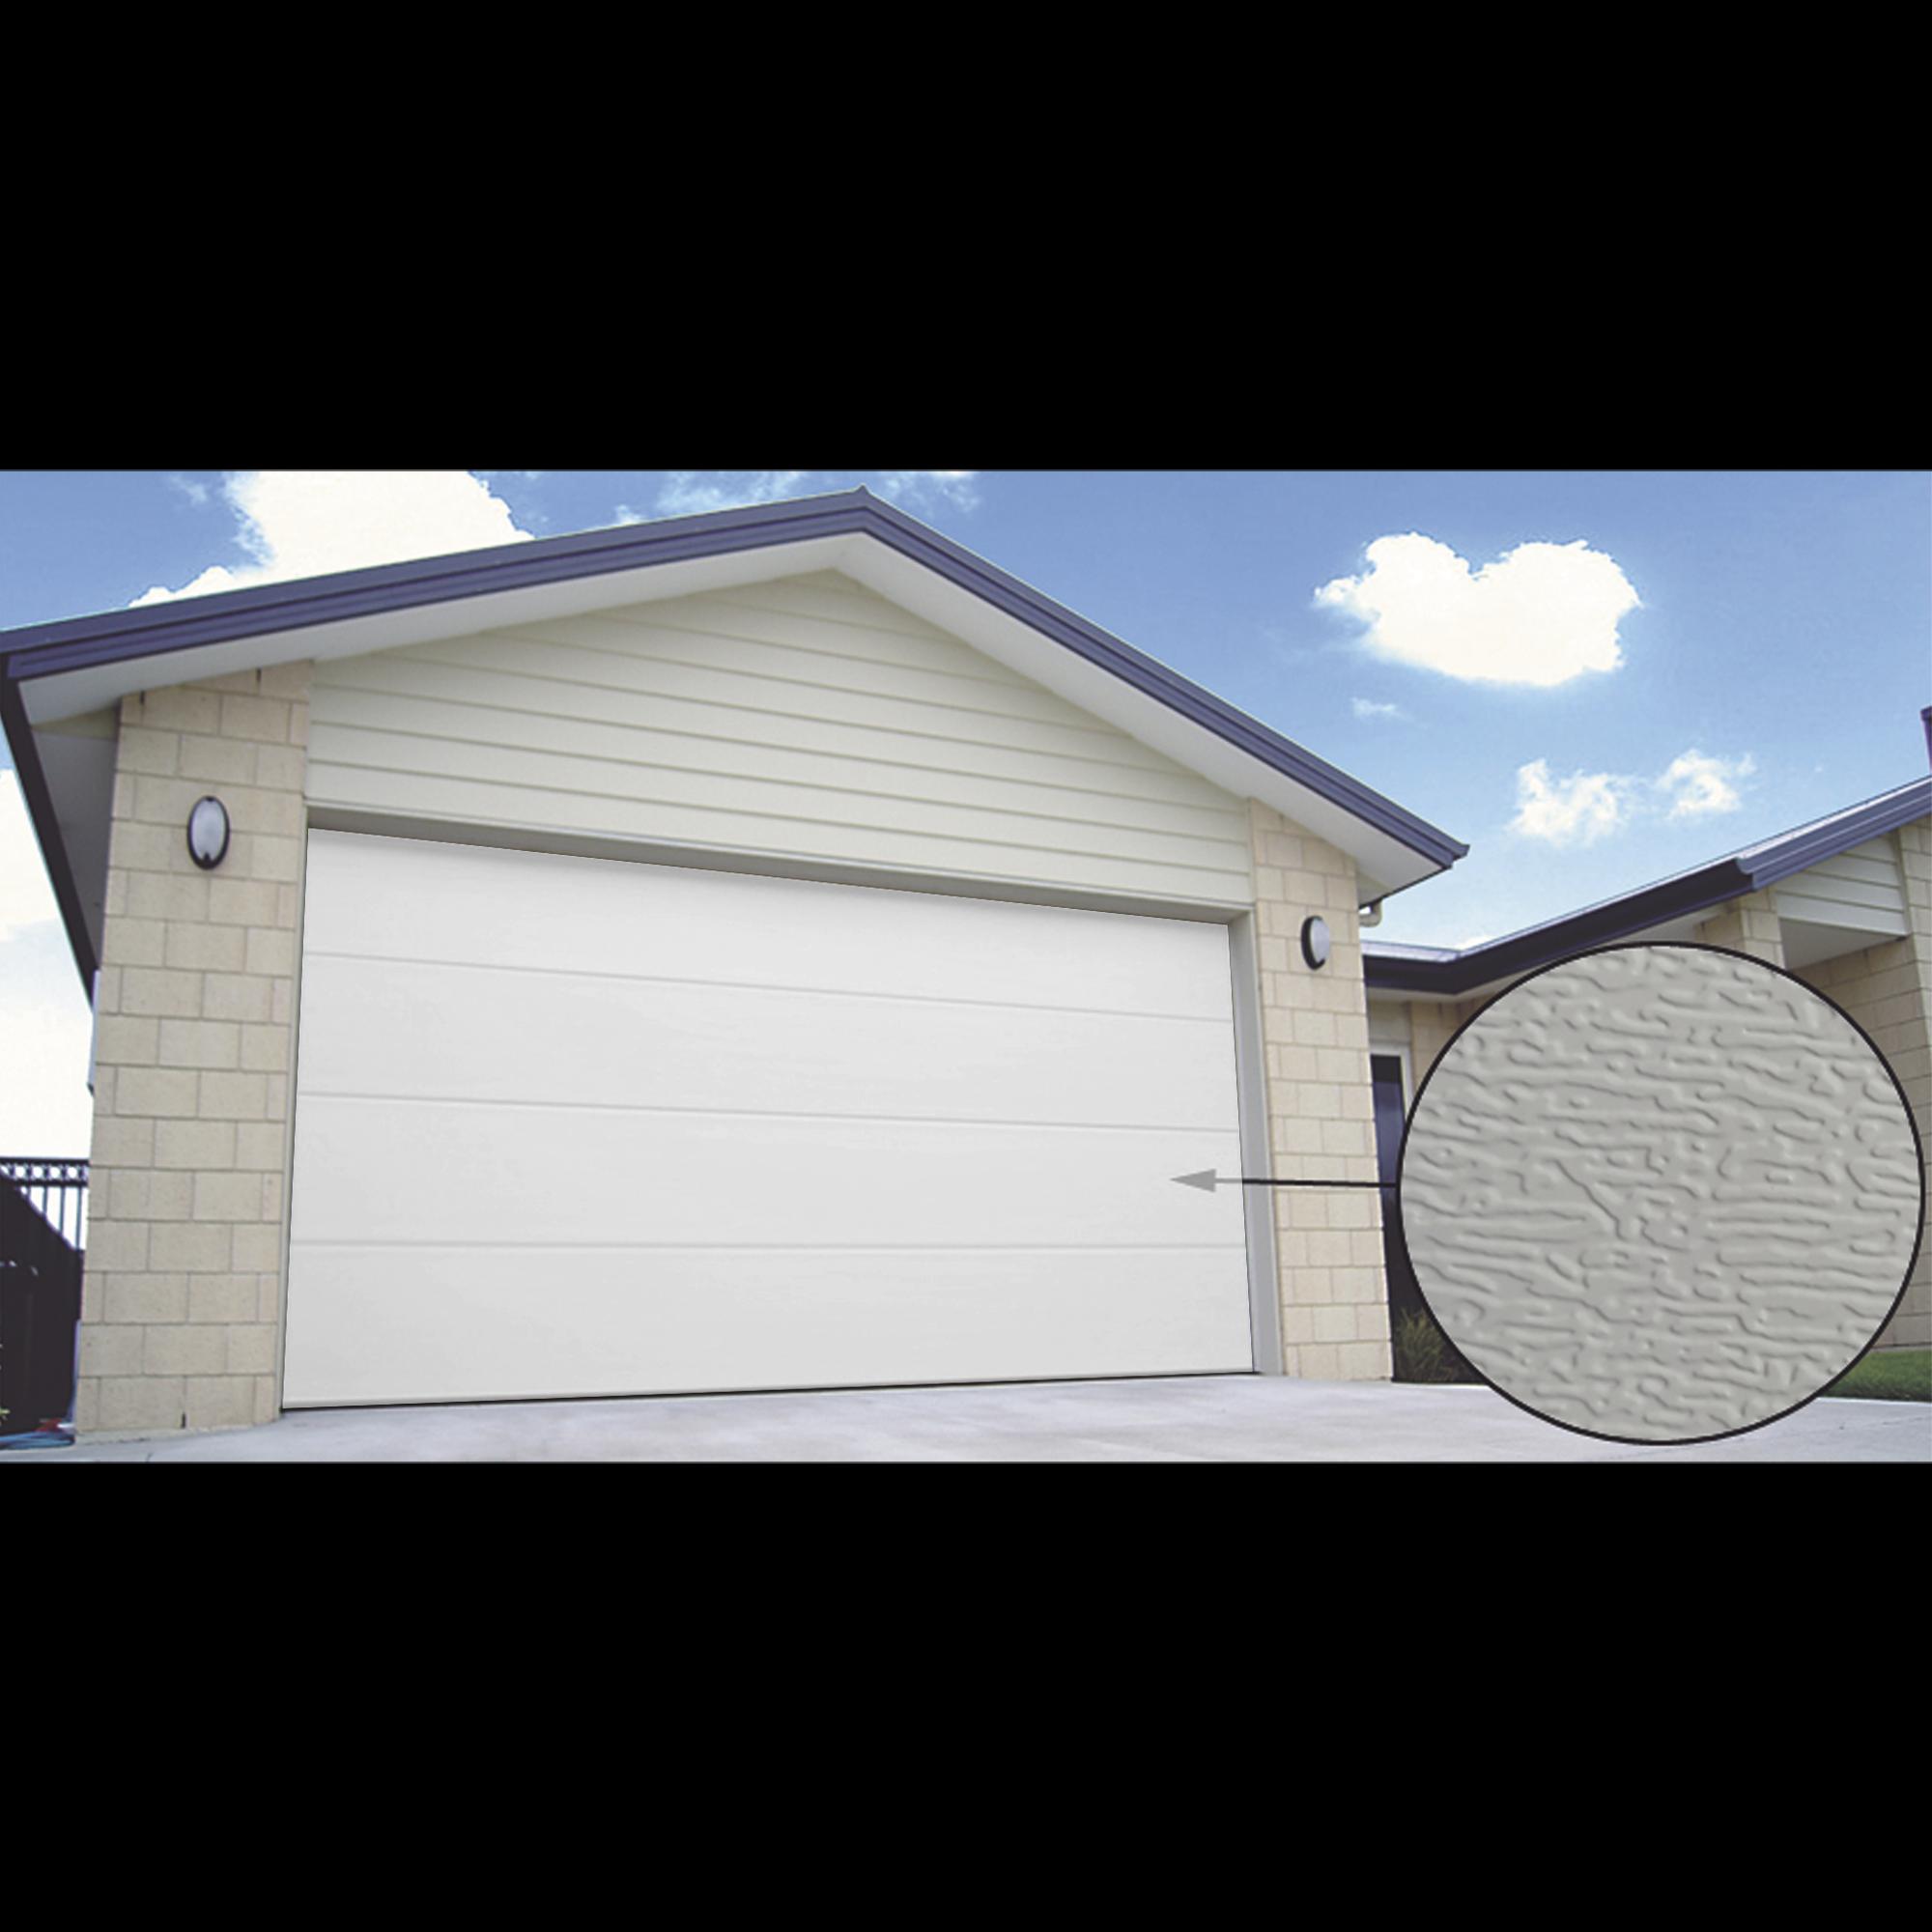 Puerta de Garage PREMIUM, Lisa color blanco 9X8 FT, AISLADA, Estilo U.S.A.